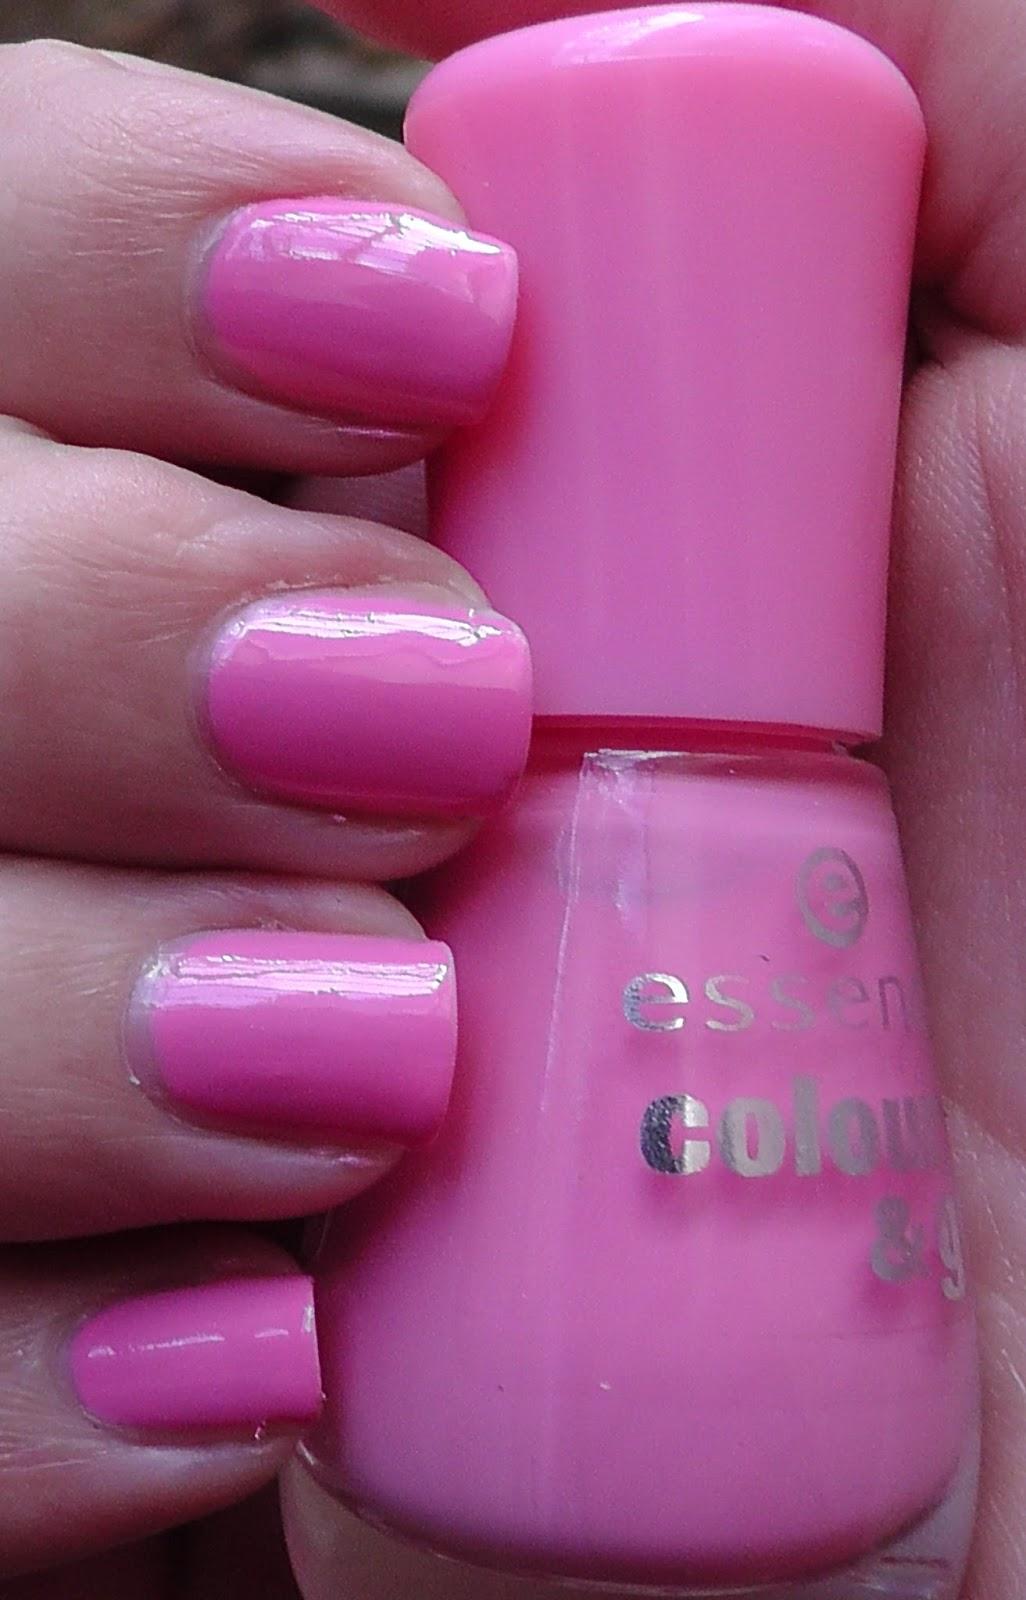 Das Mini bloggt: 7 Shades of Pink! Teil 4